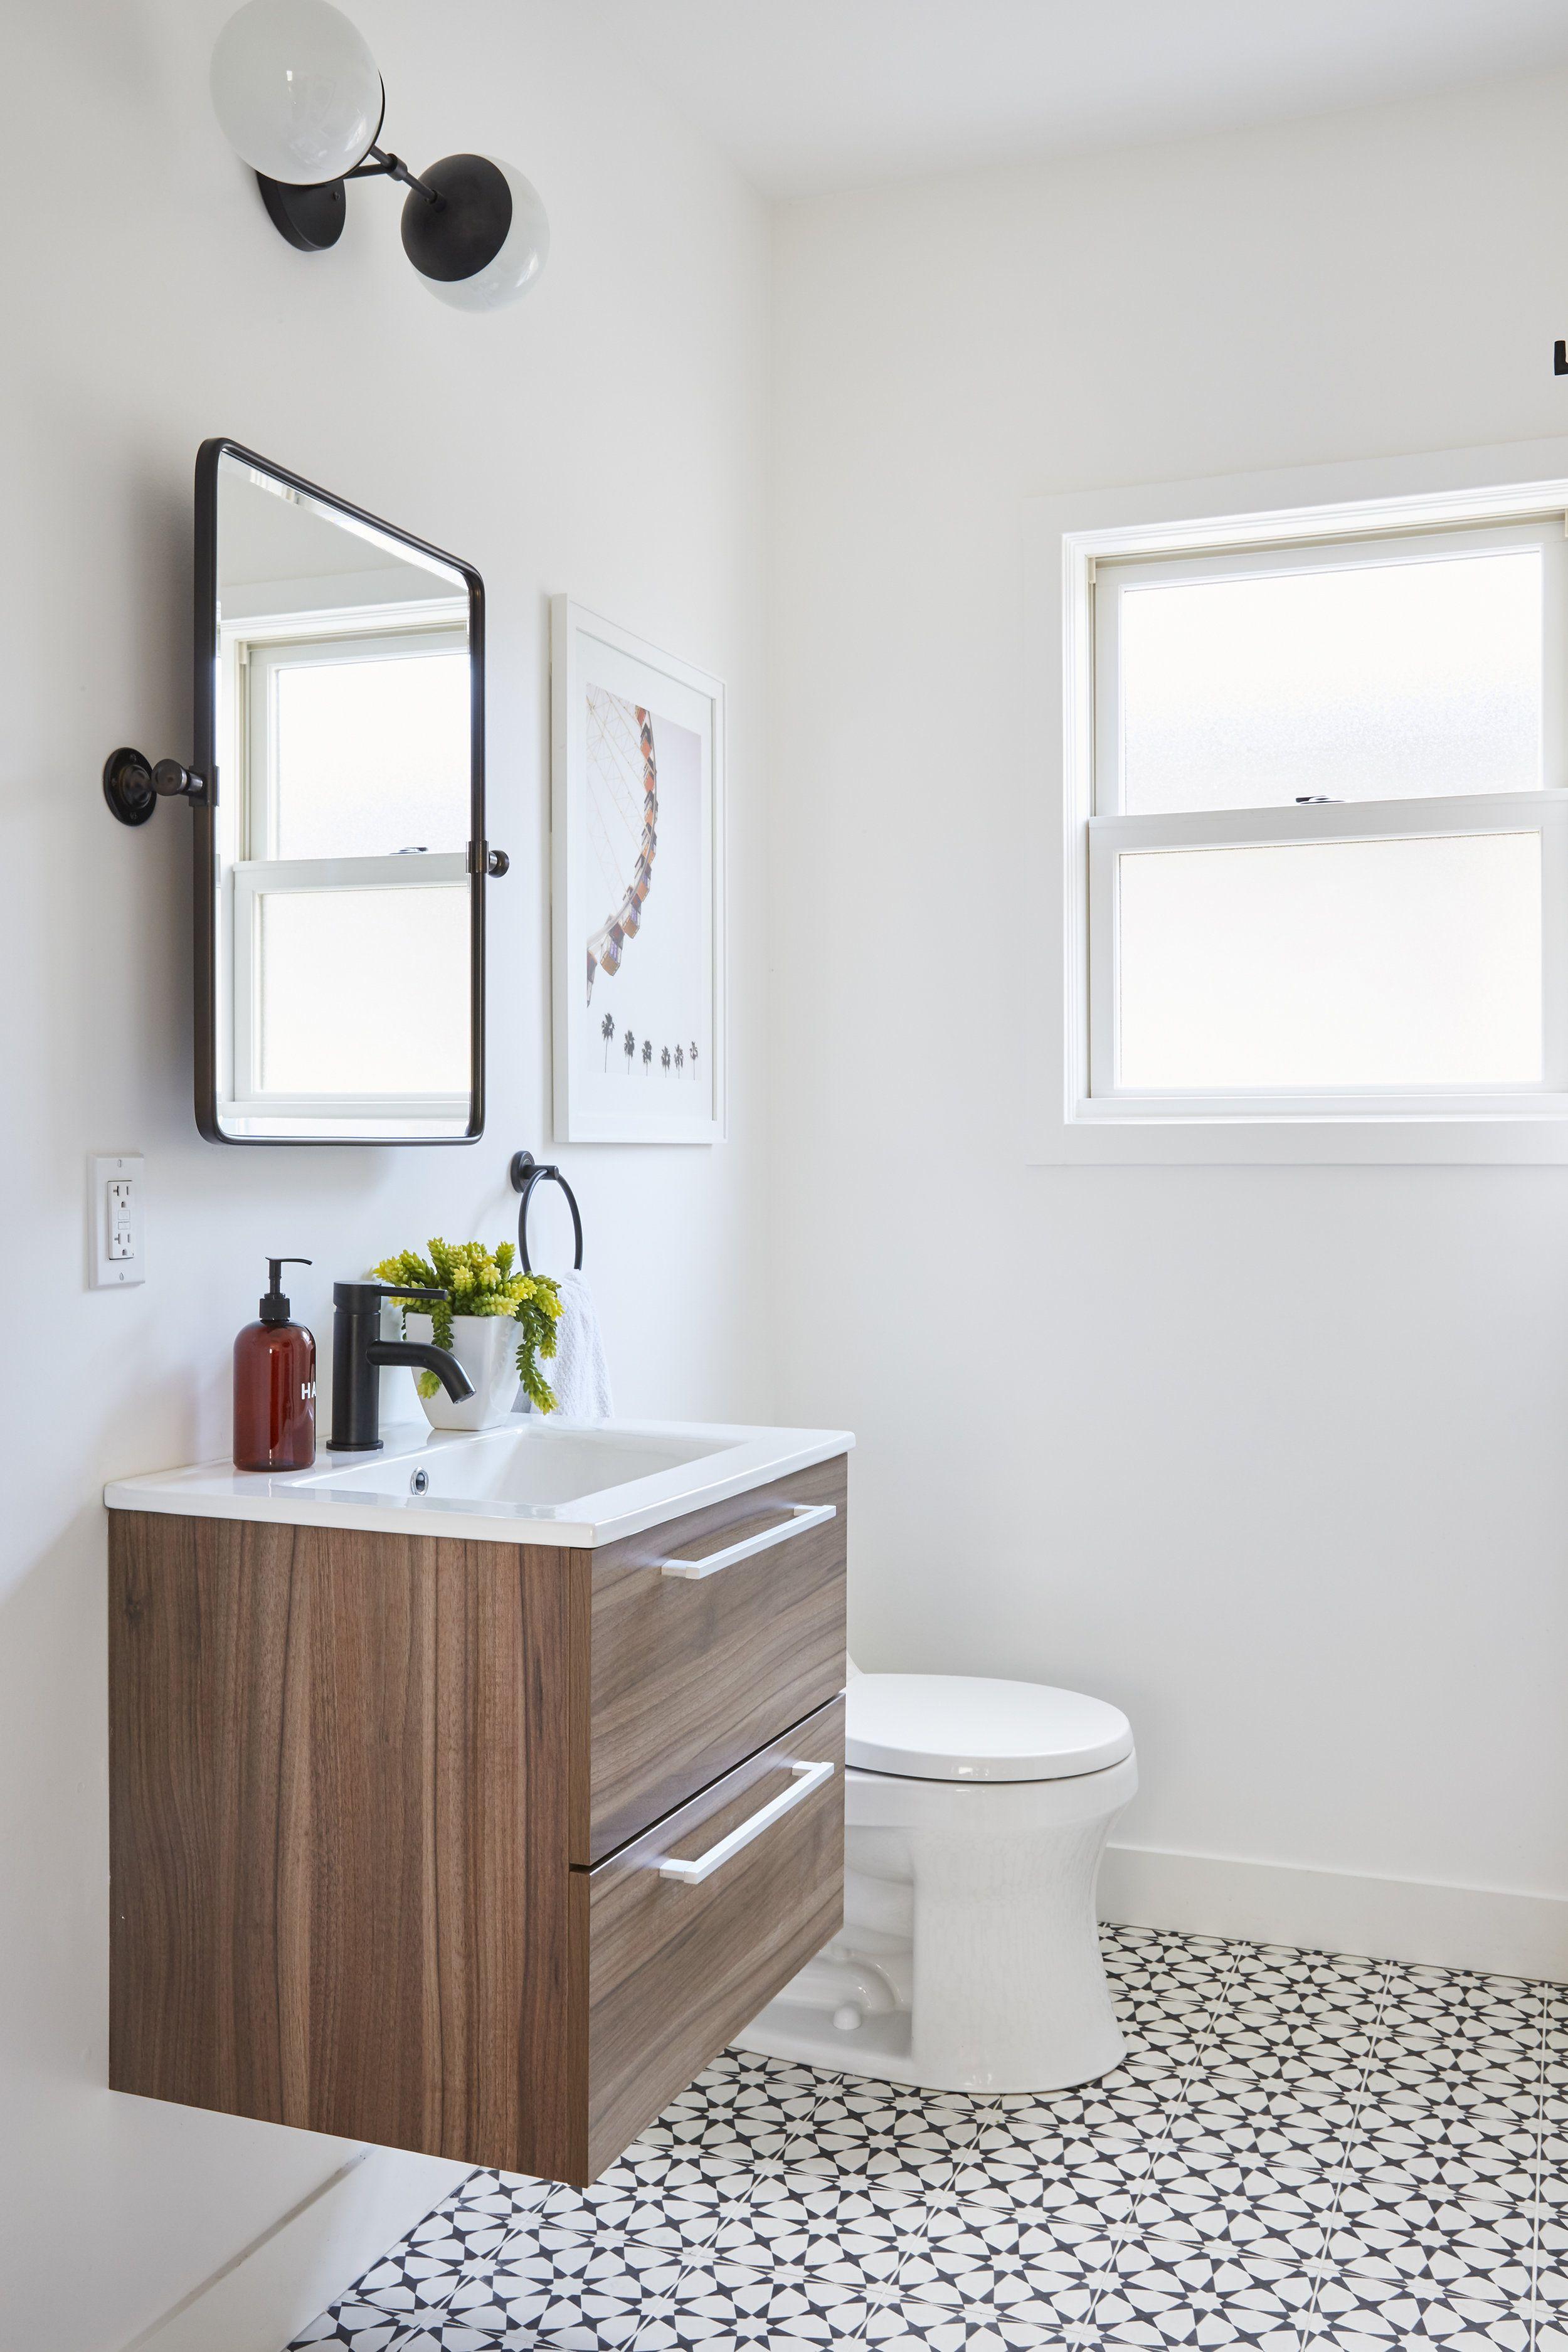 Modern Bathroom Floating Walnut Vanity Matte Black Fixtures Patterned Cement Tile Nina Jizhar Desig Bathroom Trends Bathroom Vanity Trends Bathroom Decor White walnut bathroom remodel